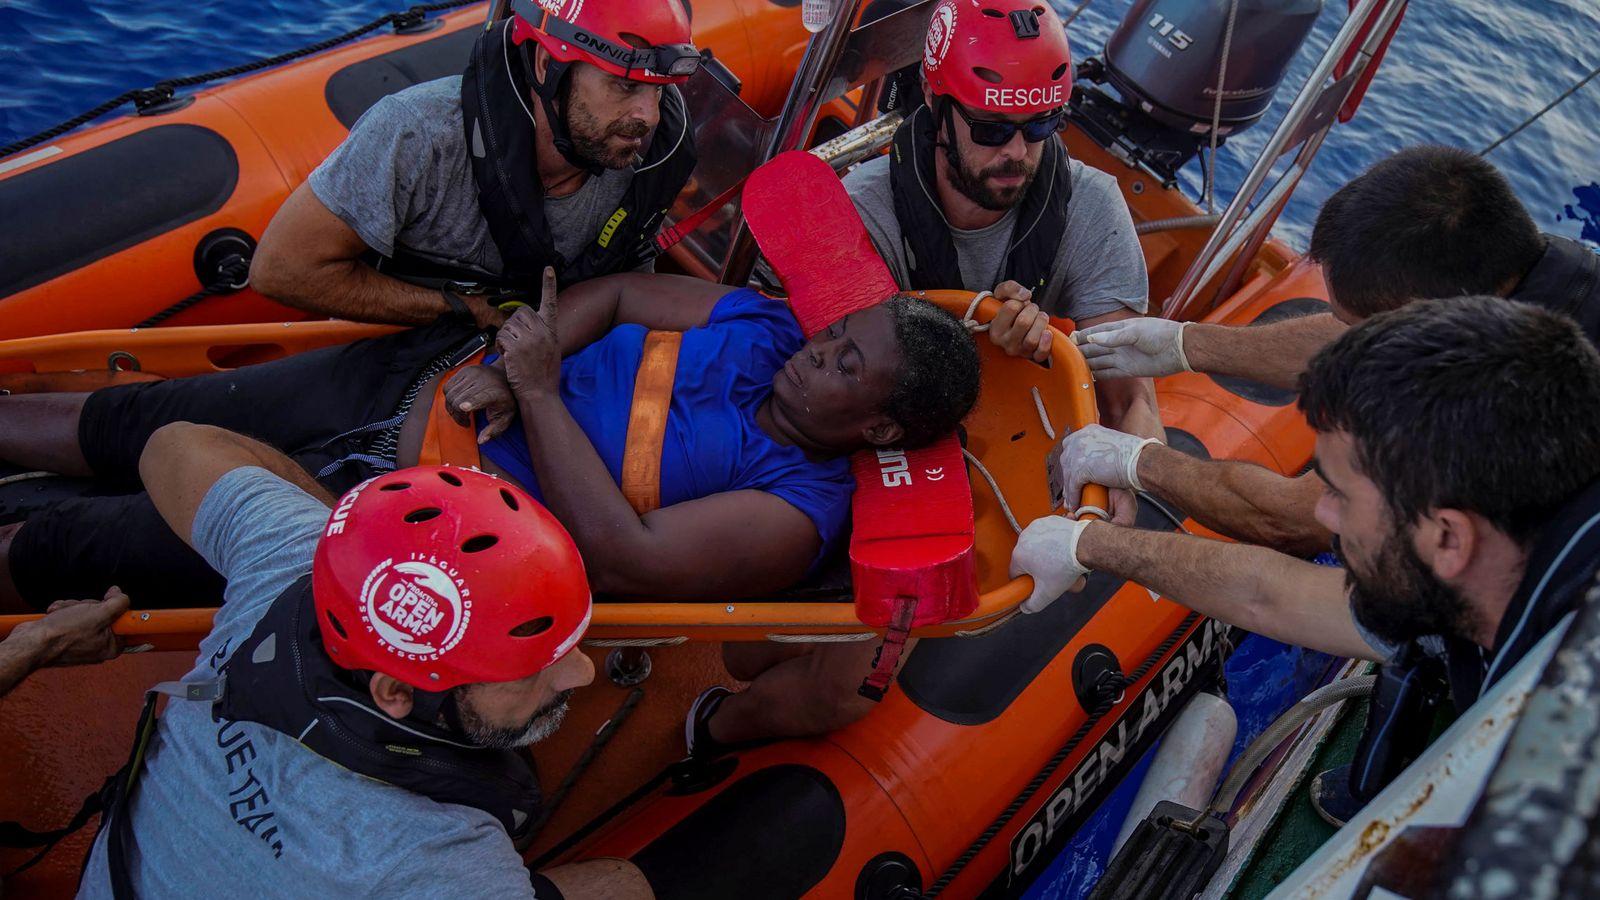 Foto: Marc Gasol, arriba a la derecha, en el momento del rescate en aguas del Mediterráneo. (Reuters)